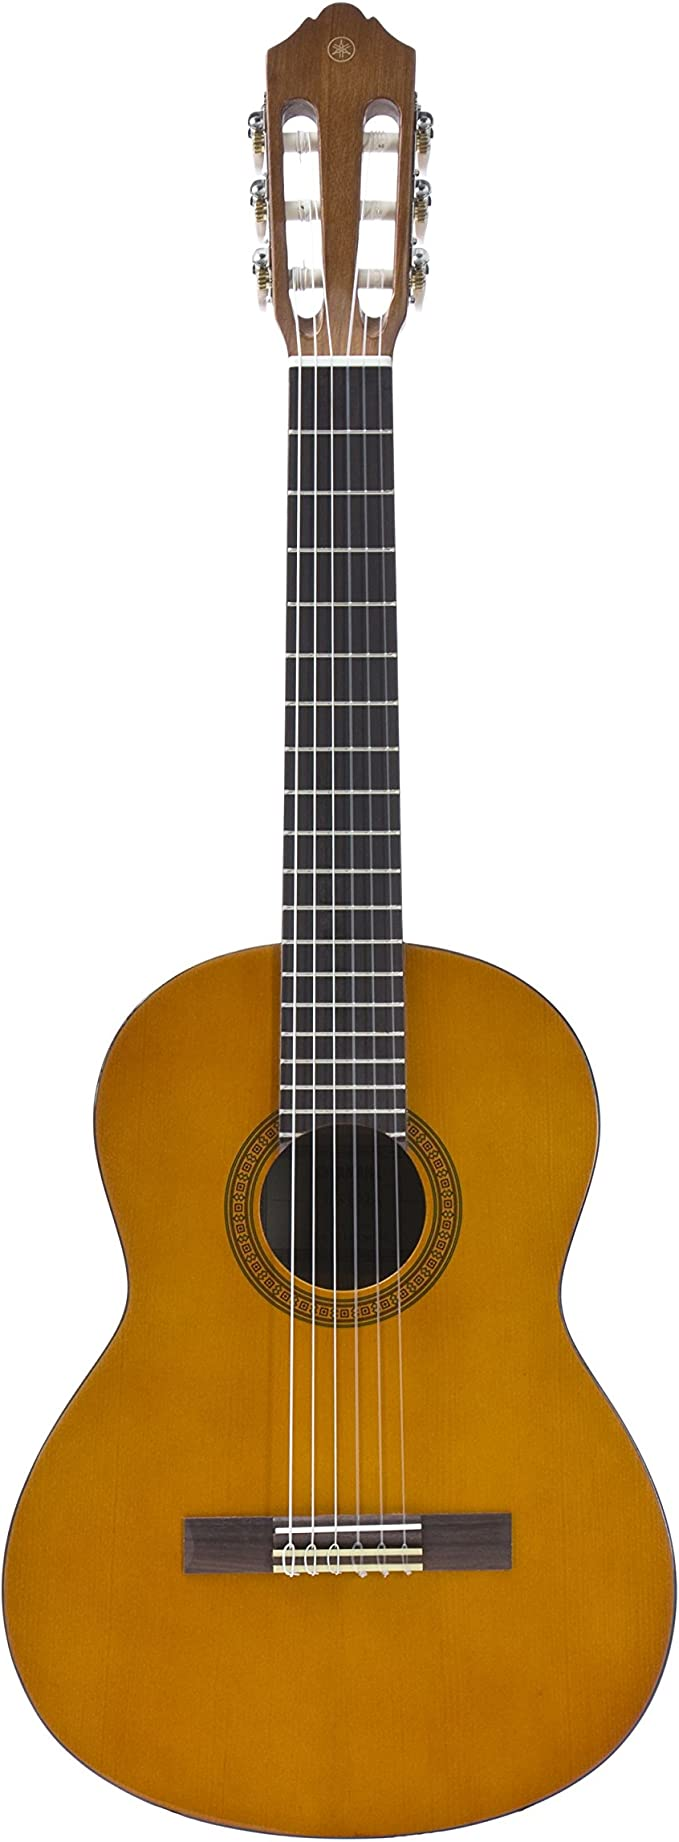 Yamaha - Guitarra clásica cgs-102a ii cadete: Amazon.es ...